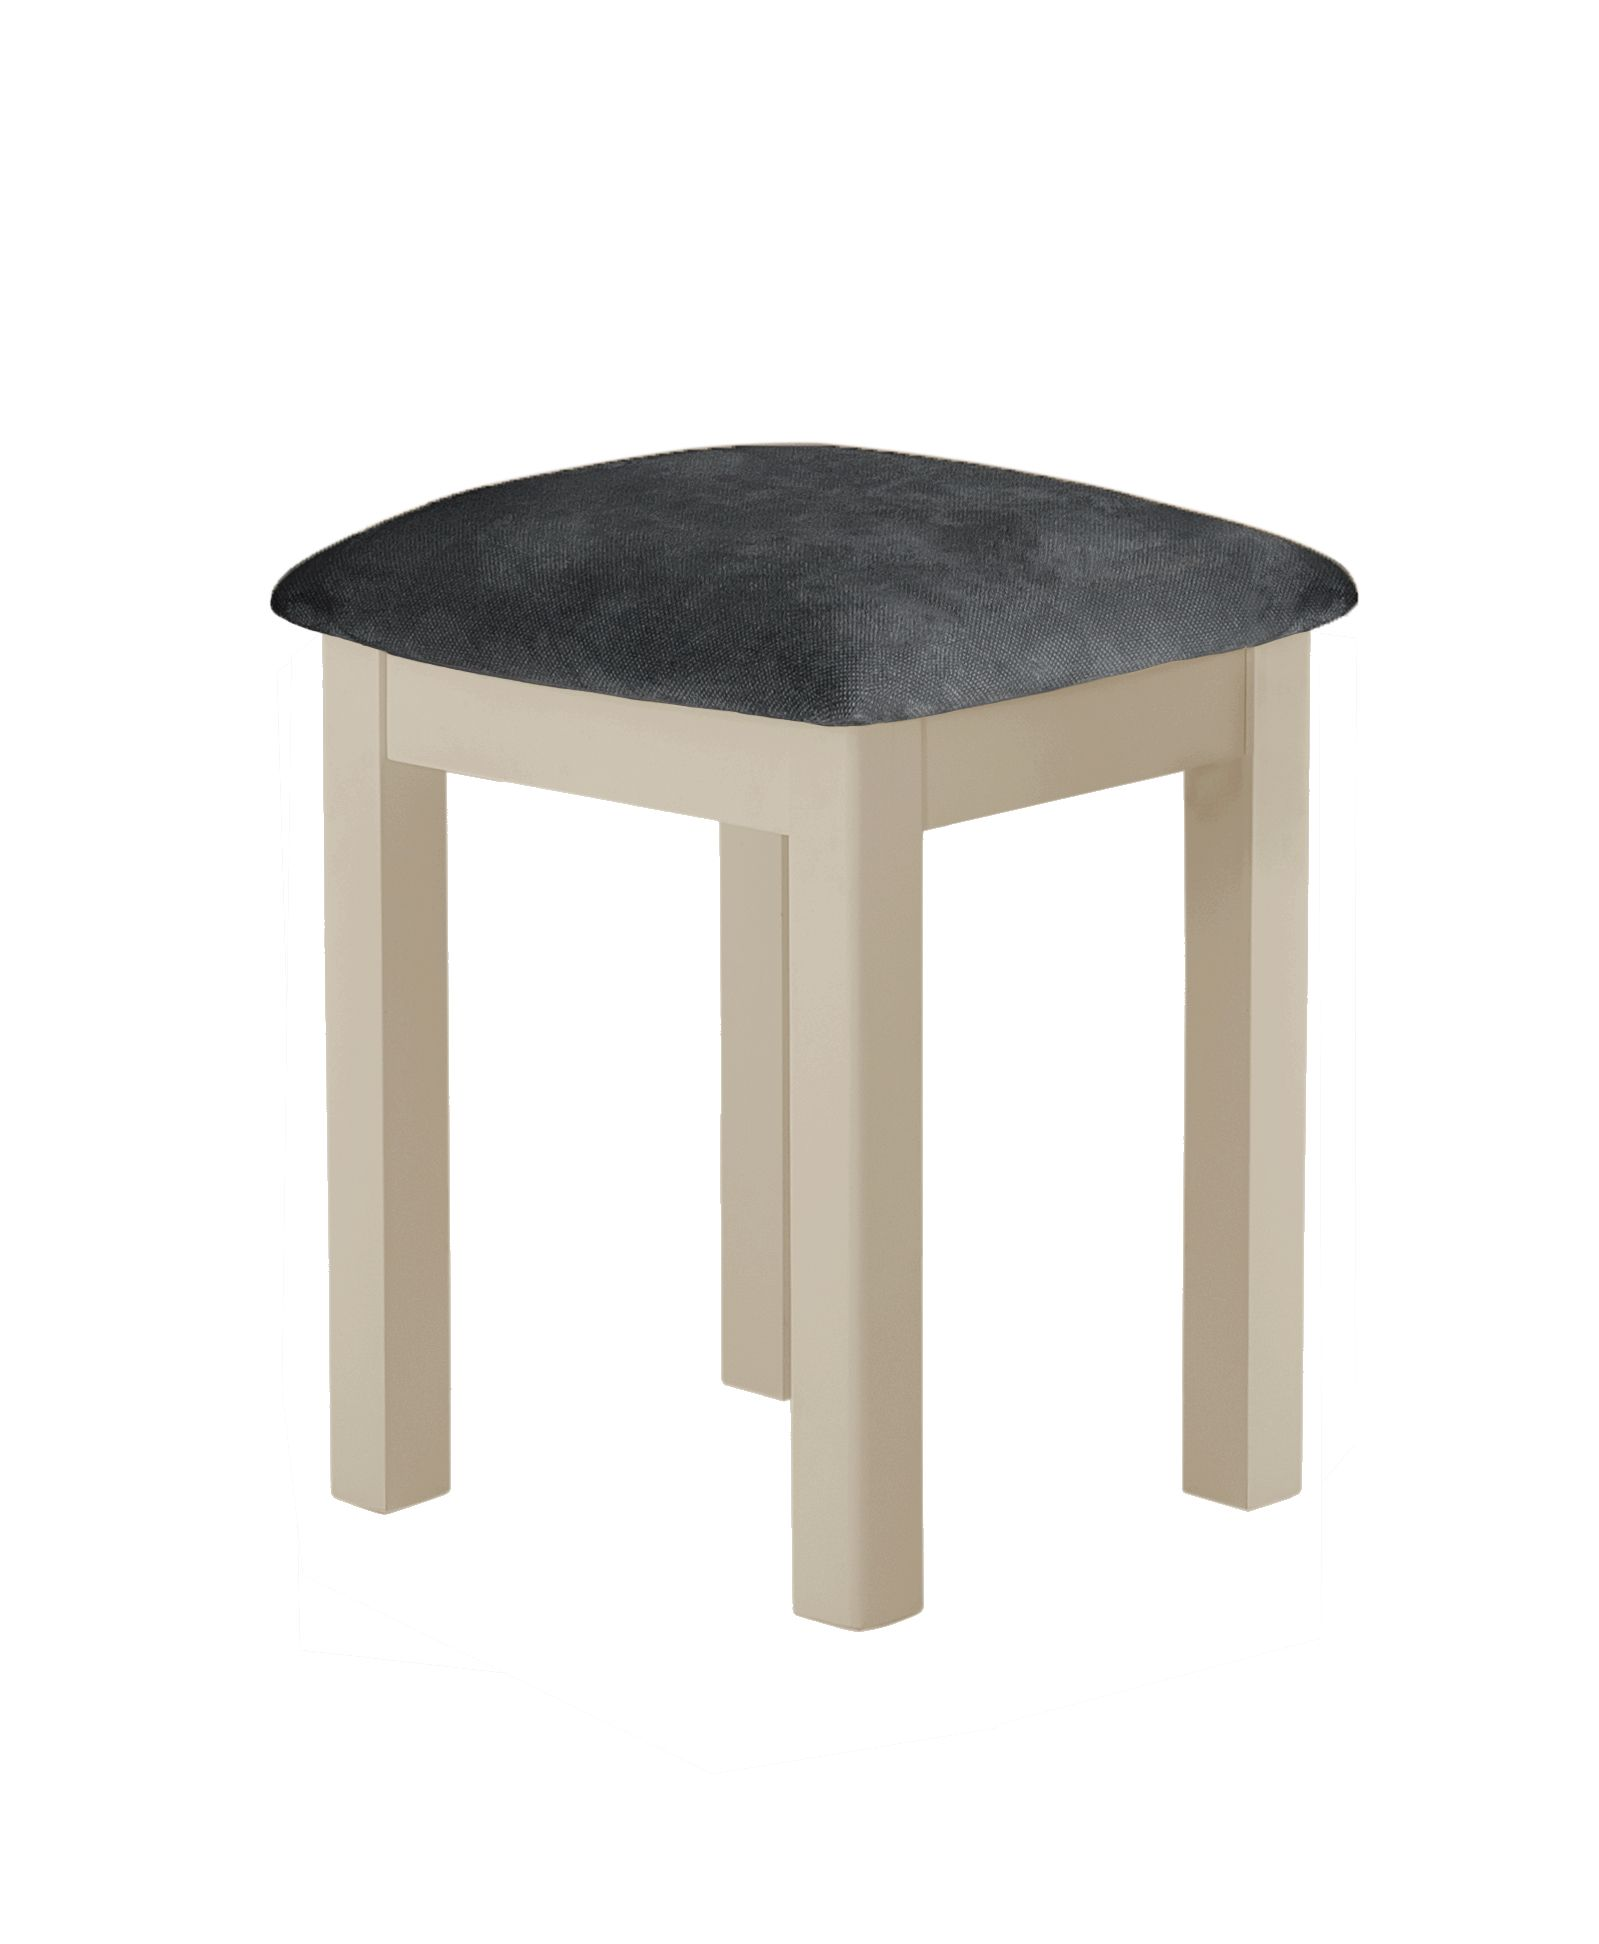 PRESTON Dressing Table Stool